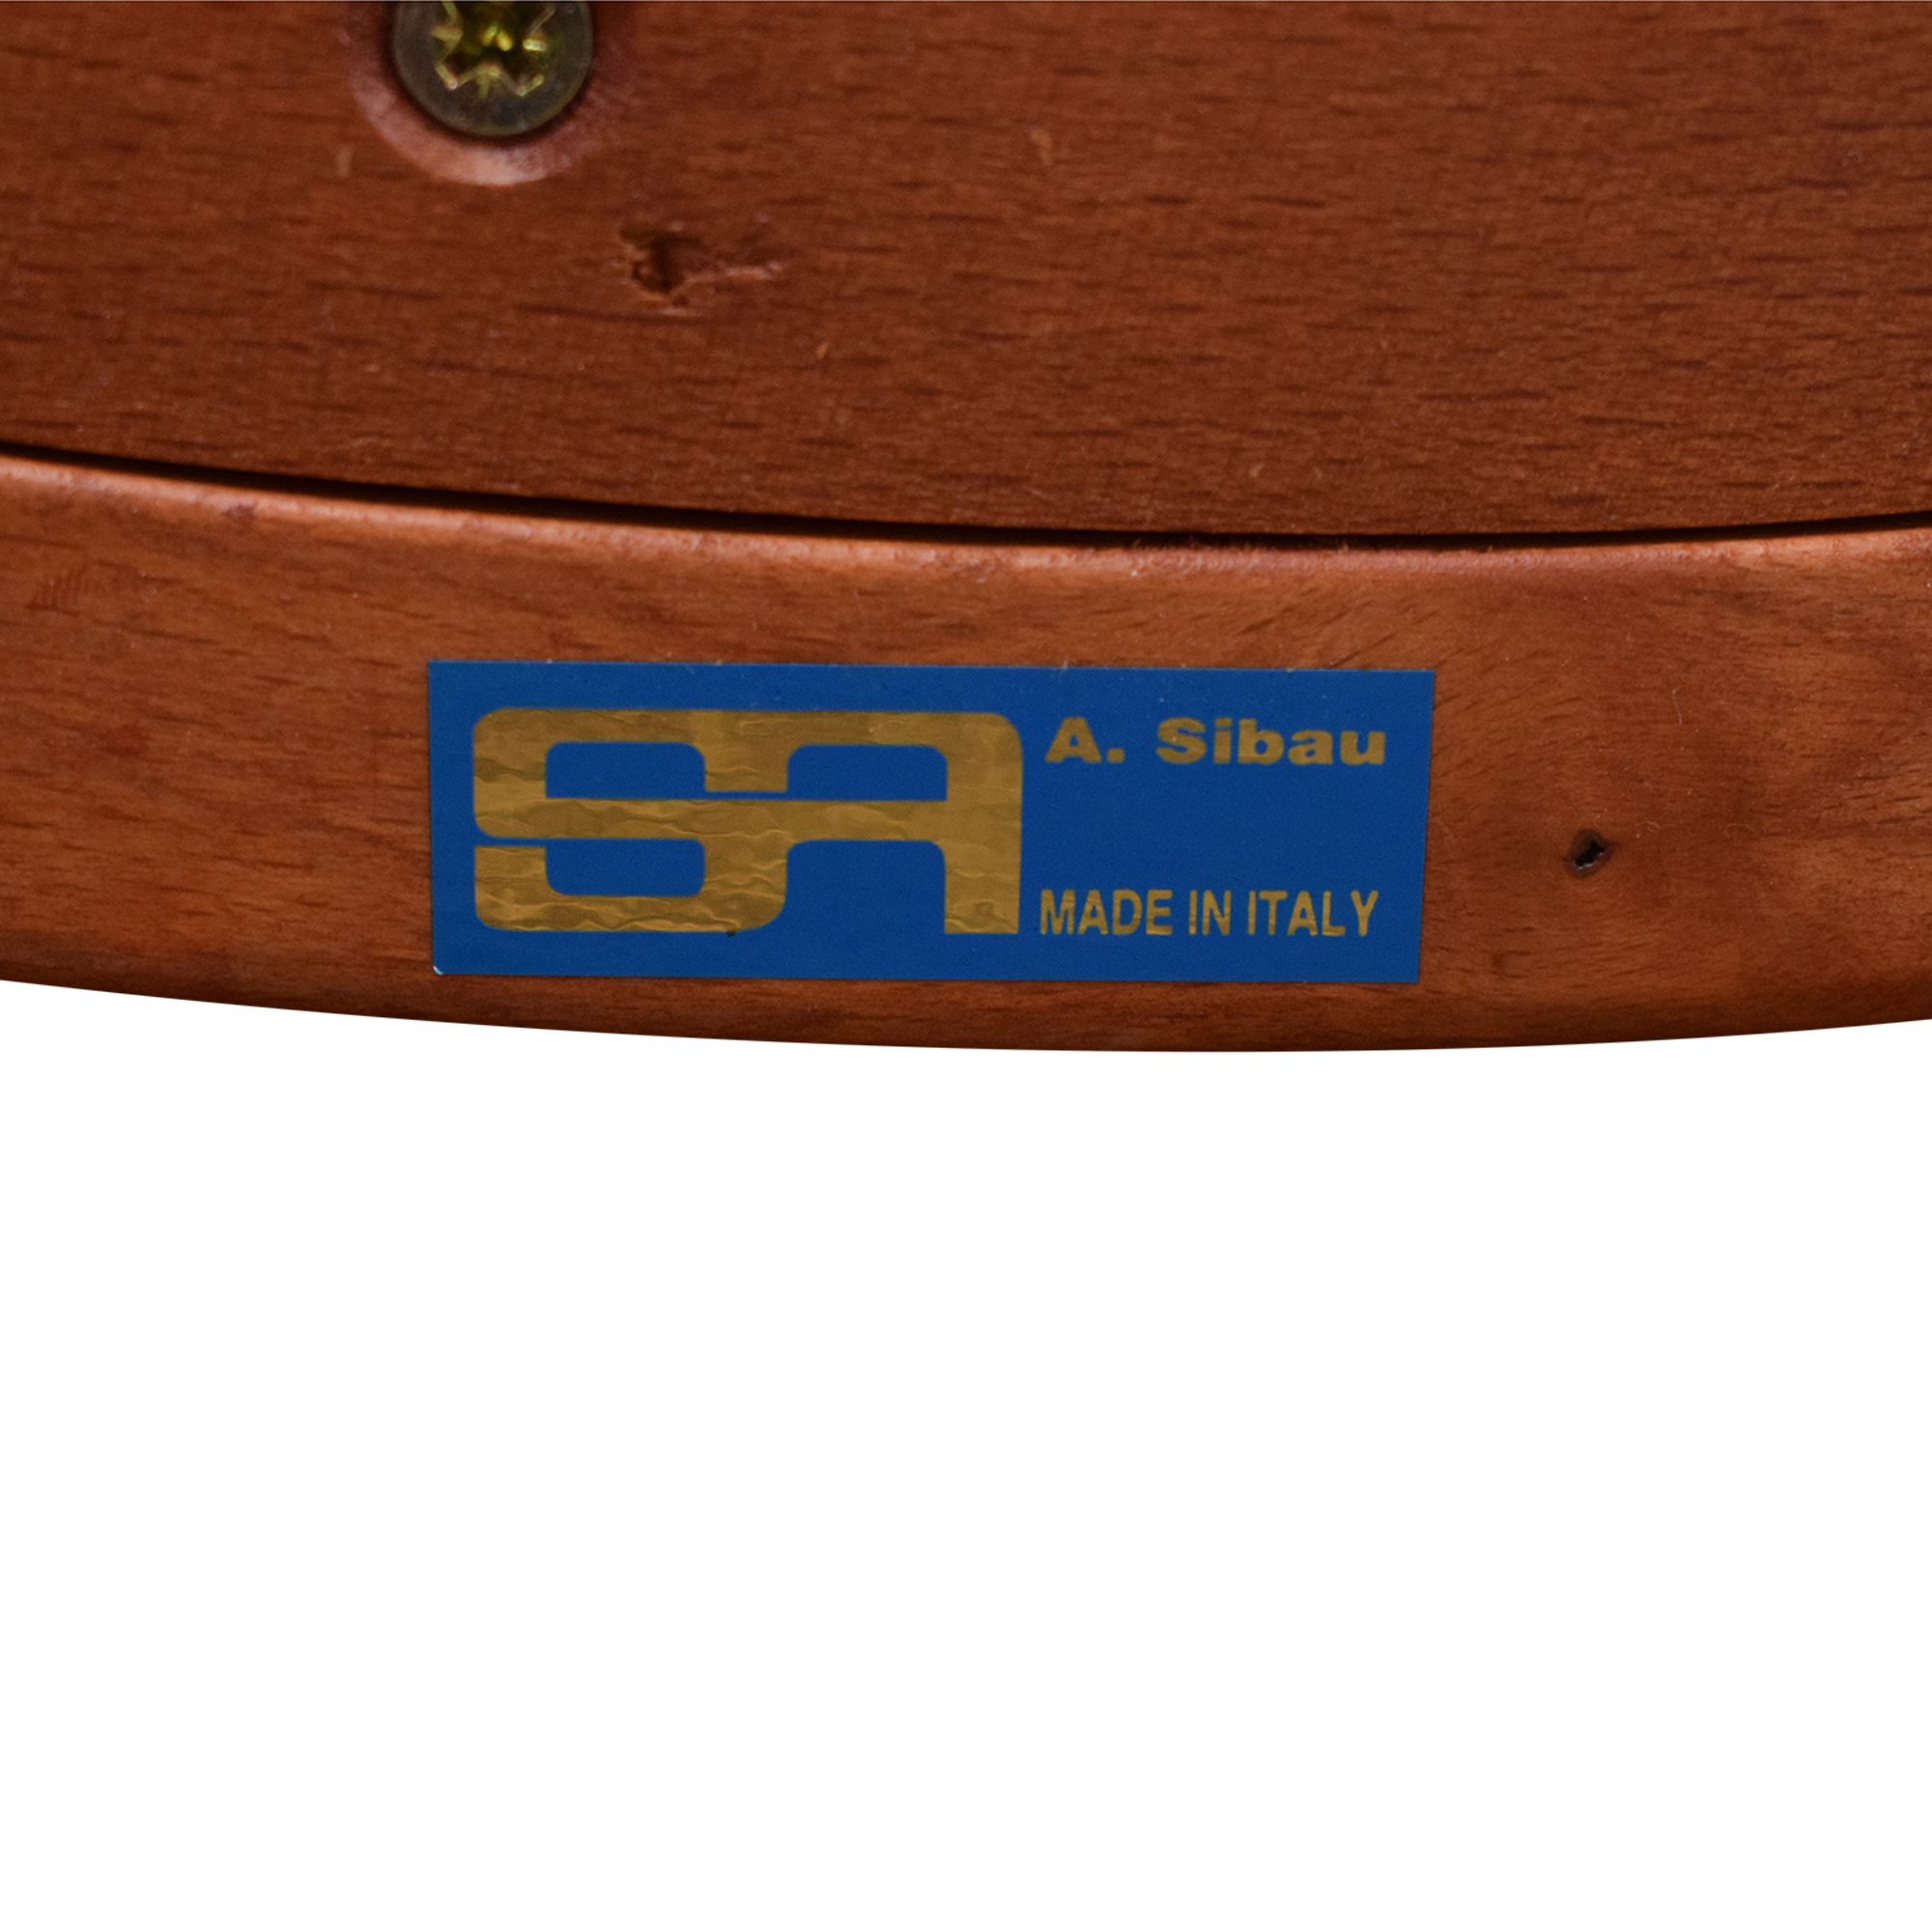 SA A. Sibau SA A. Sibau Dining Chairs ma